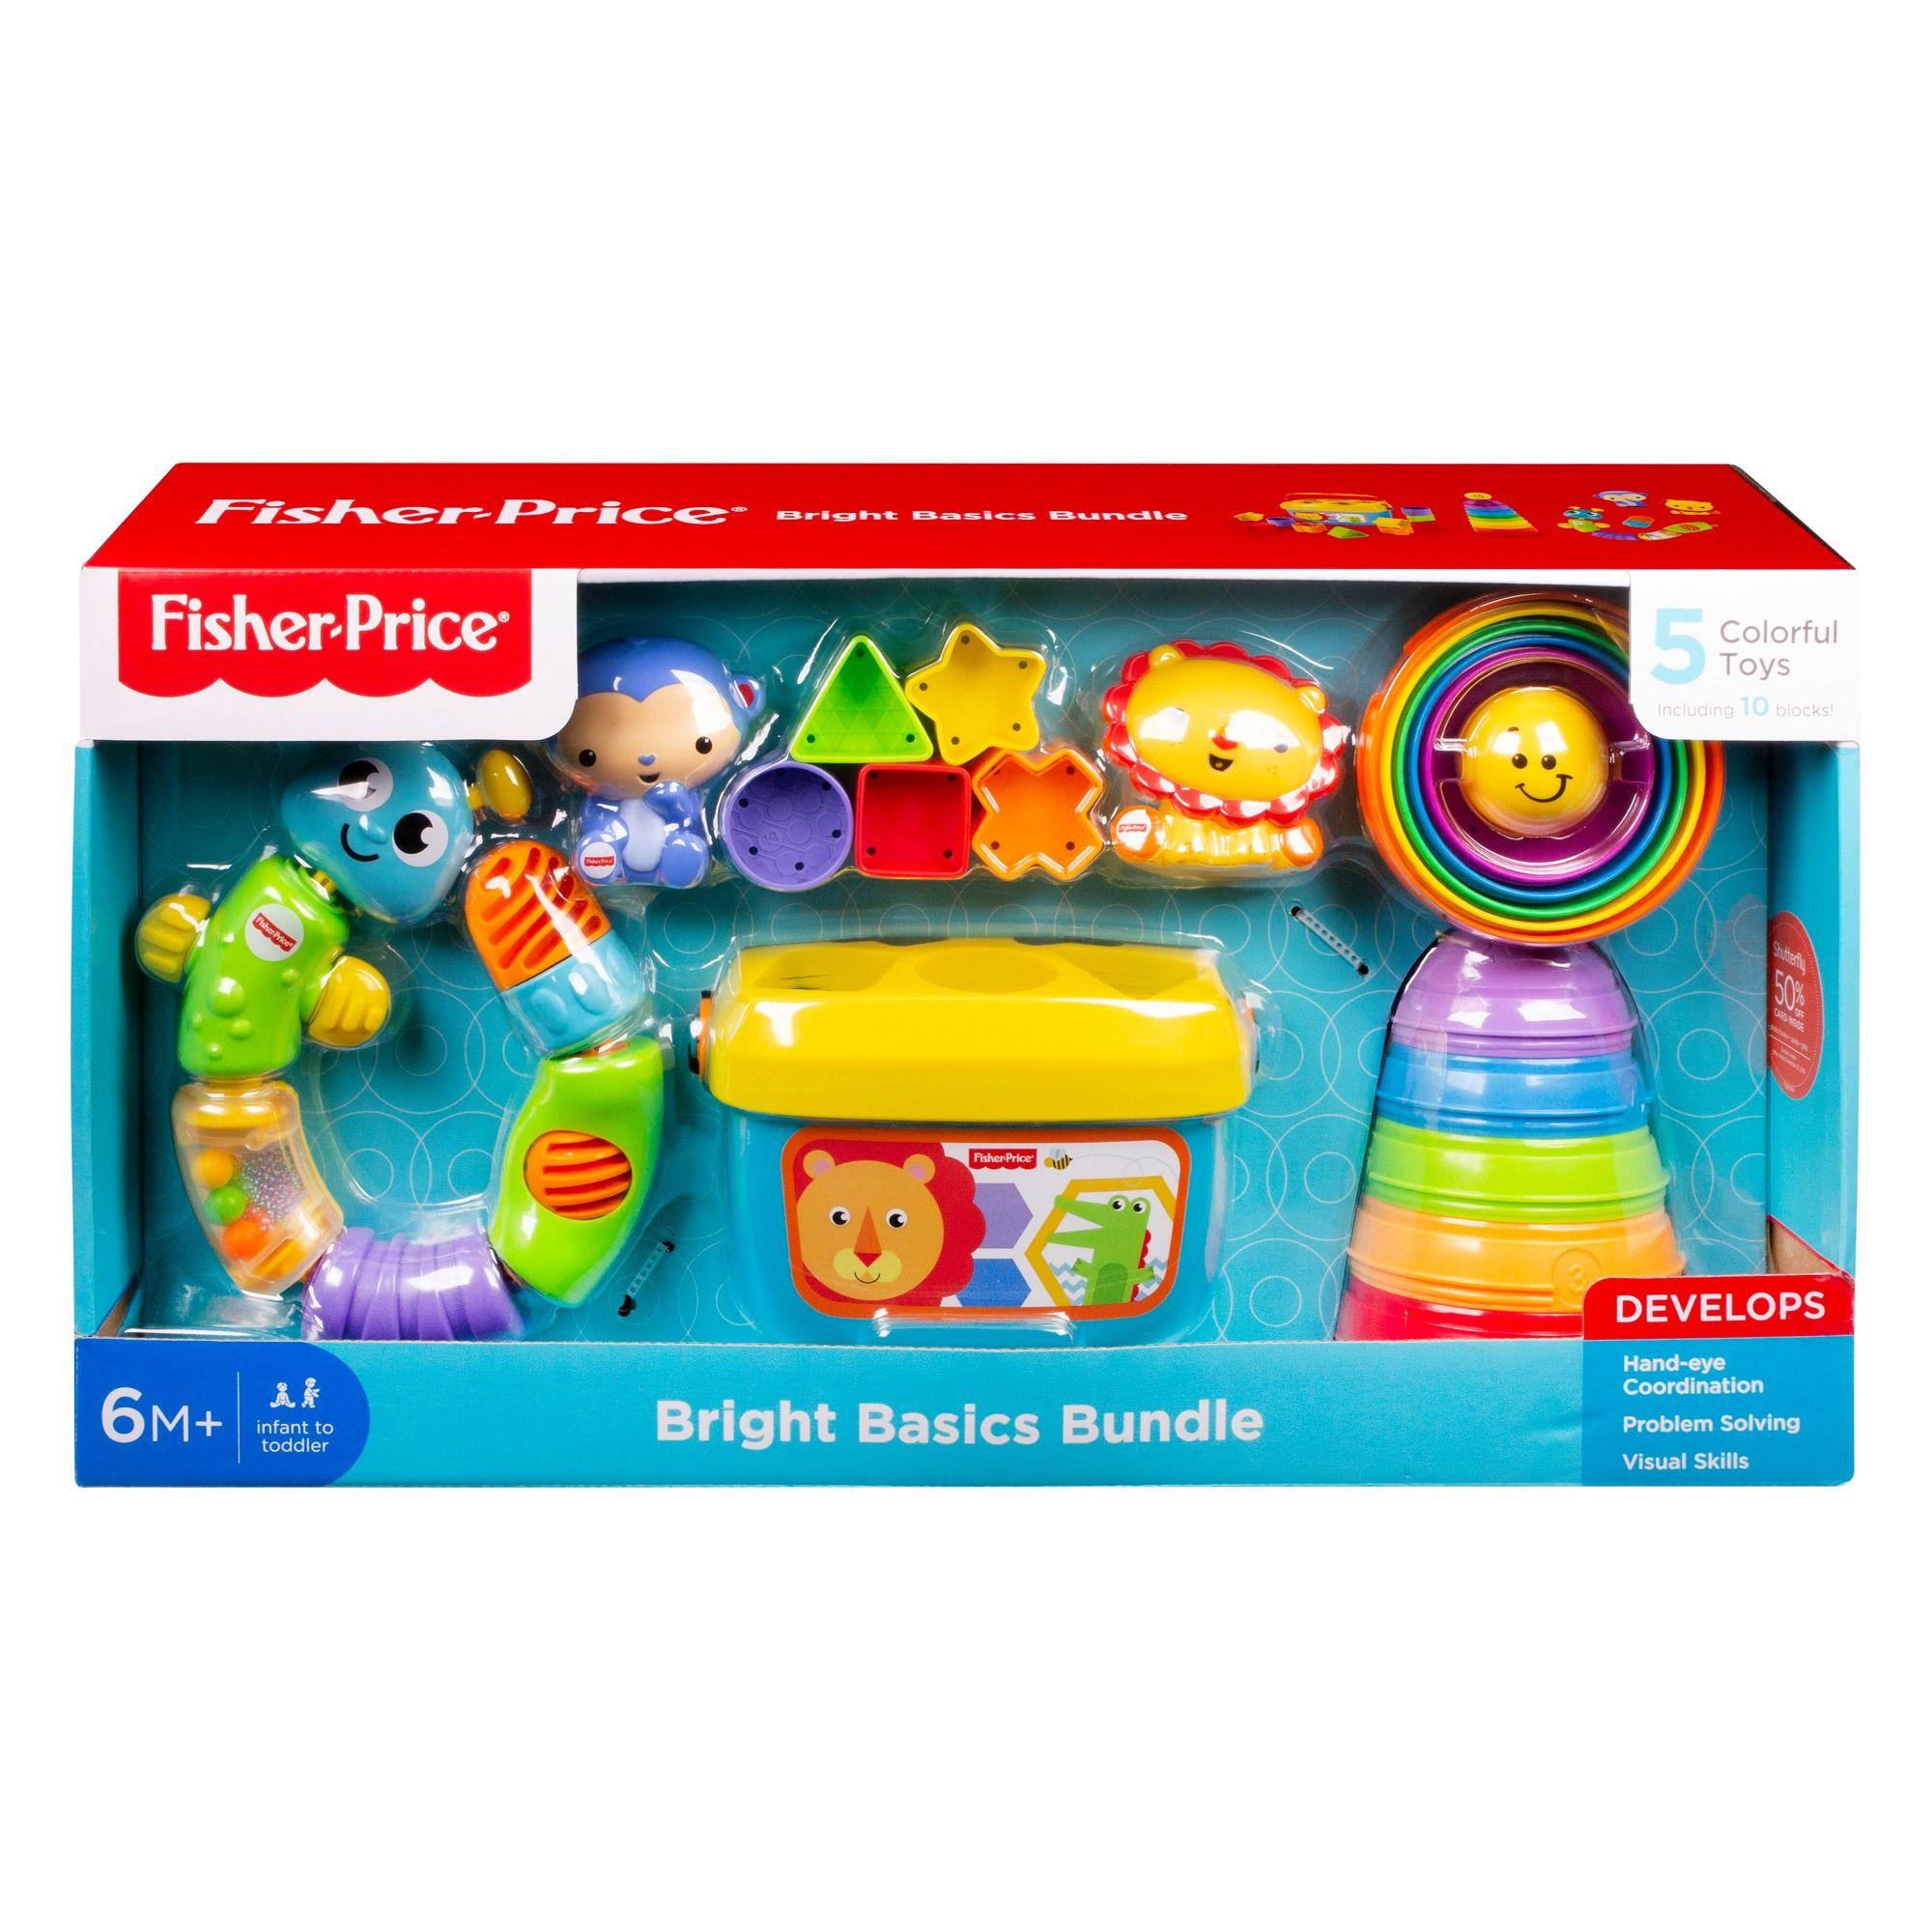 Fisher Price Bright Basics Bundle 5 Classic Toys Set 5 00 80 Off Classic Toys Fisher Price Toy Sets